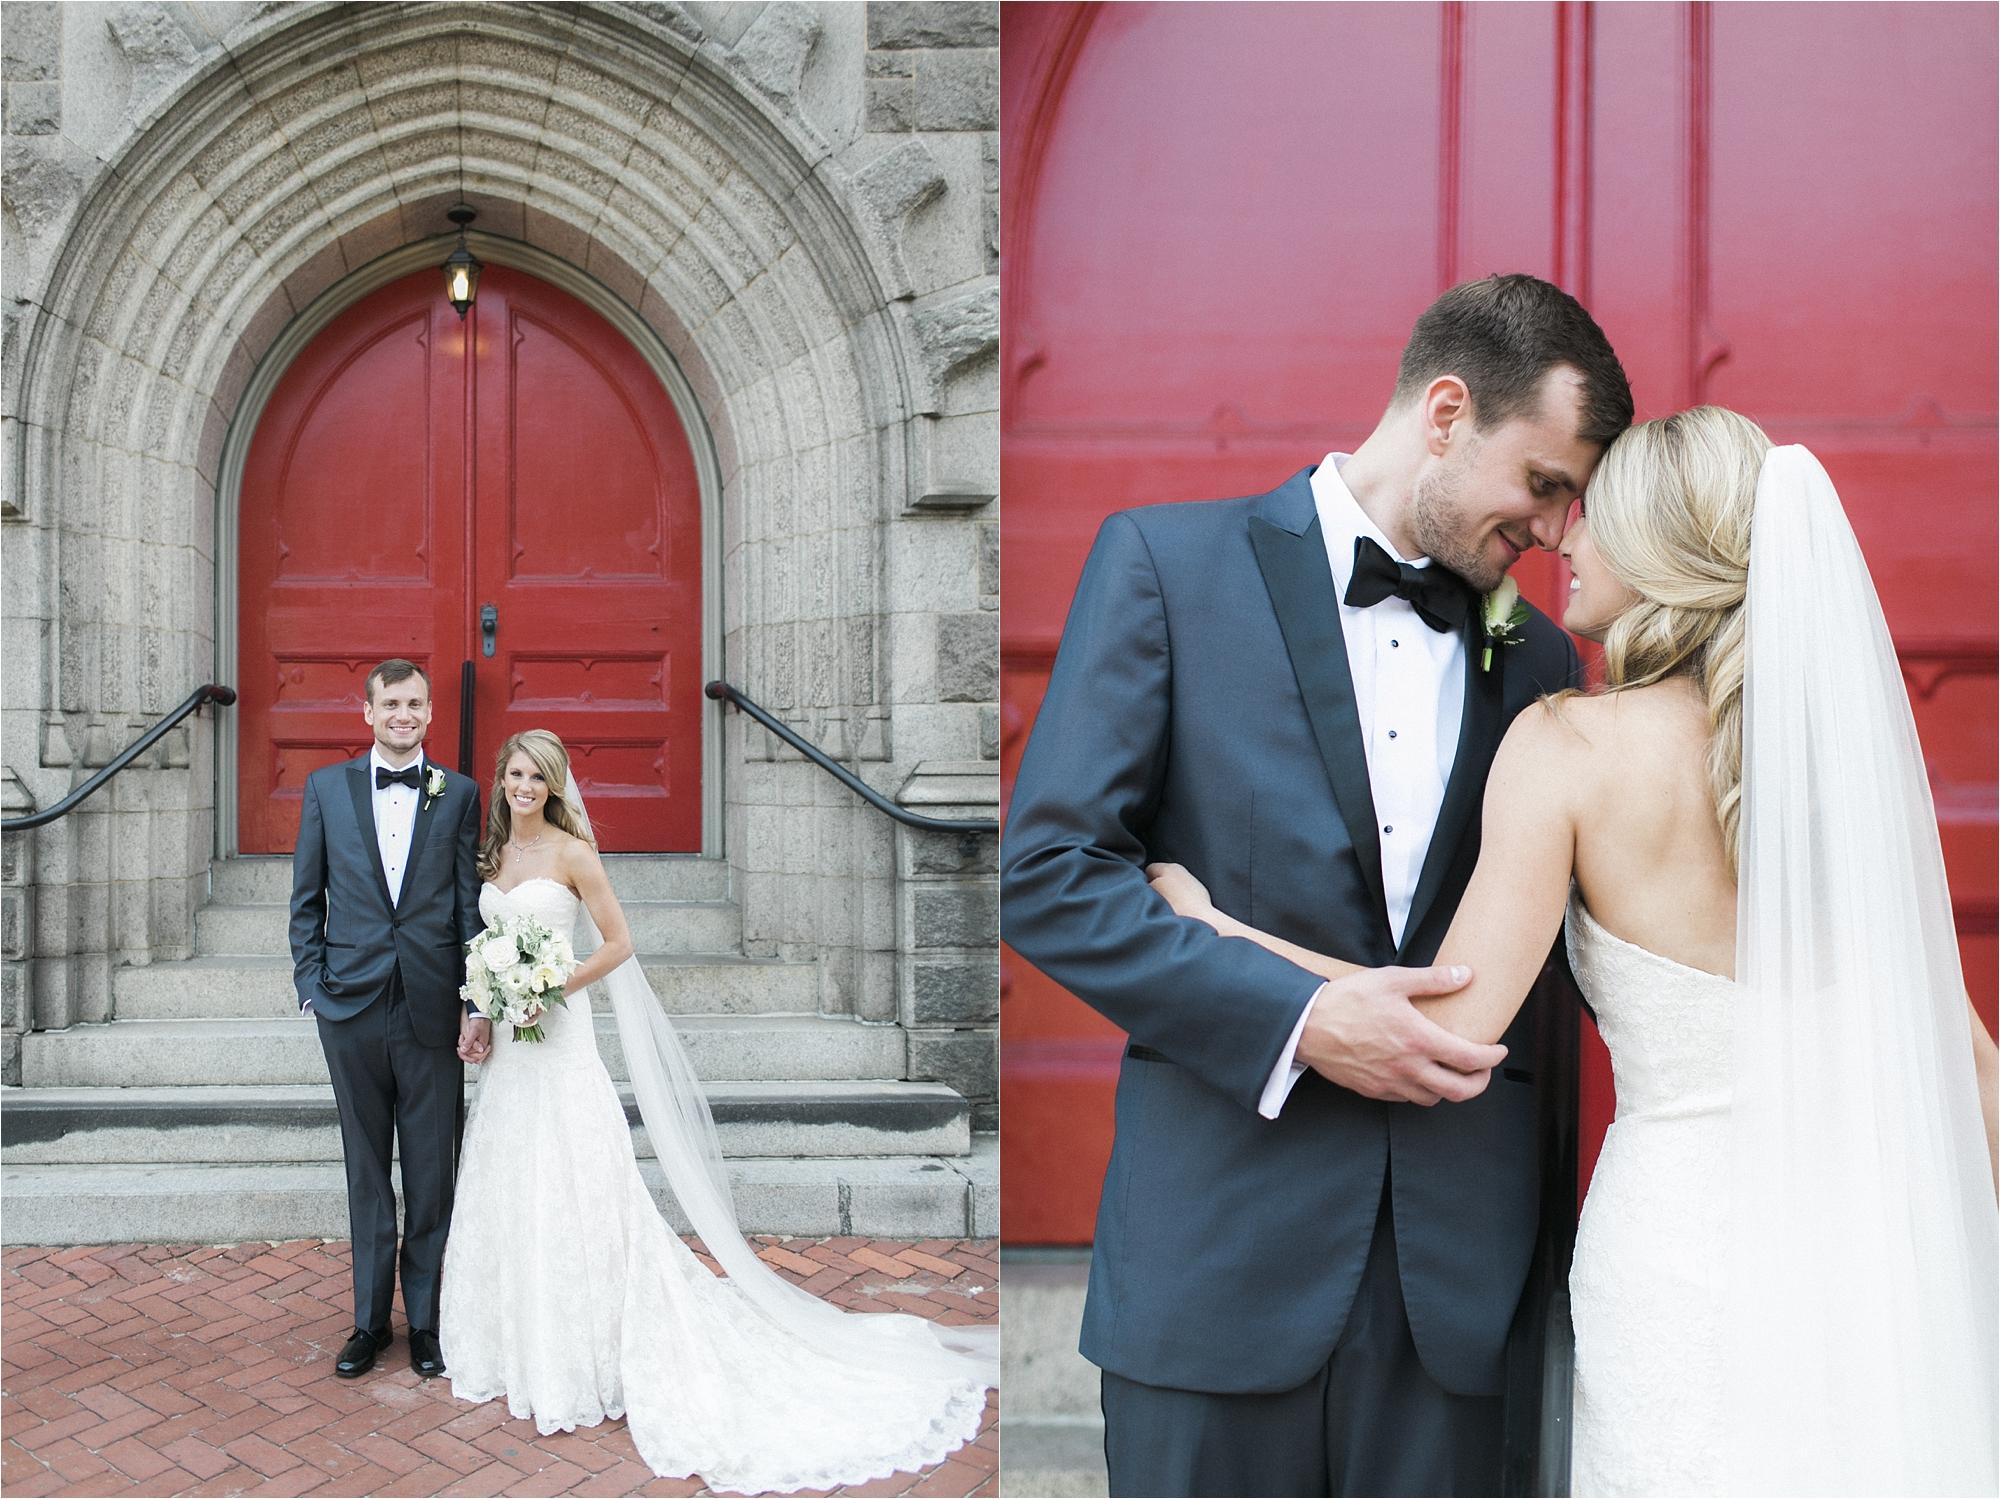 stephanie-yonce-photography-richmond-virginia-country-club-wedding_0025.jpg